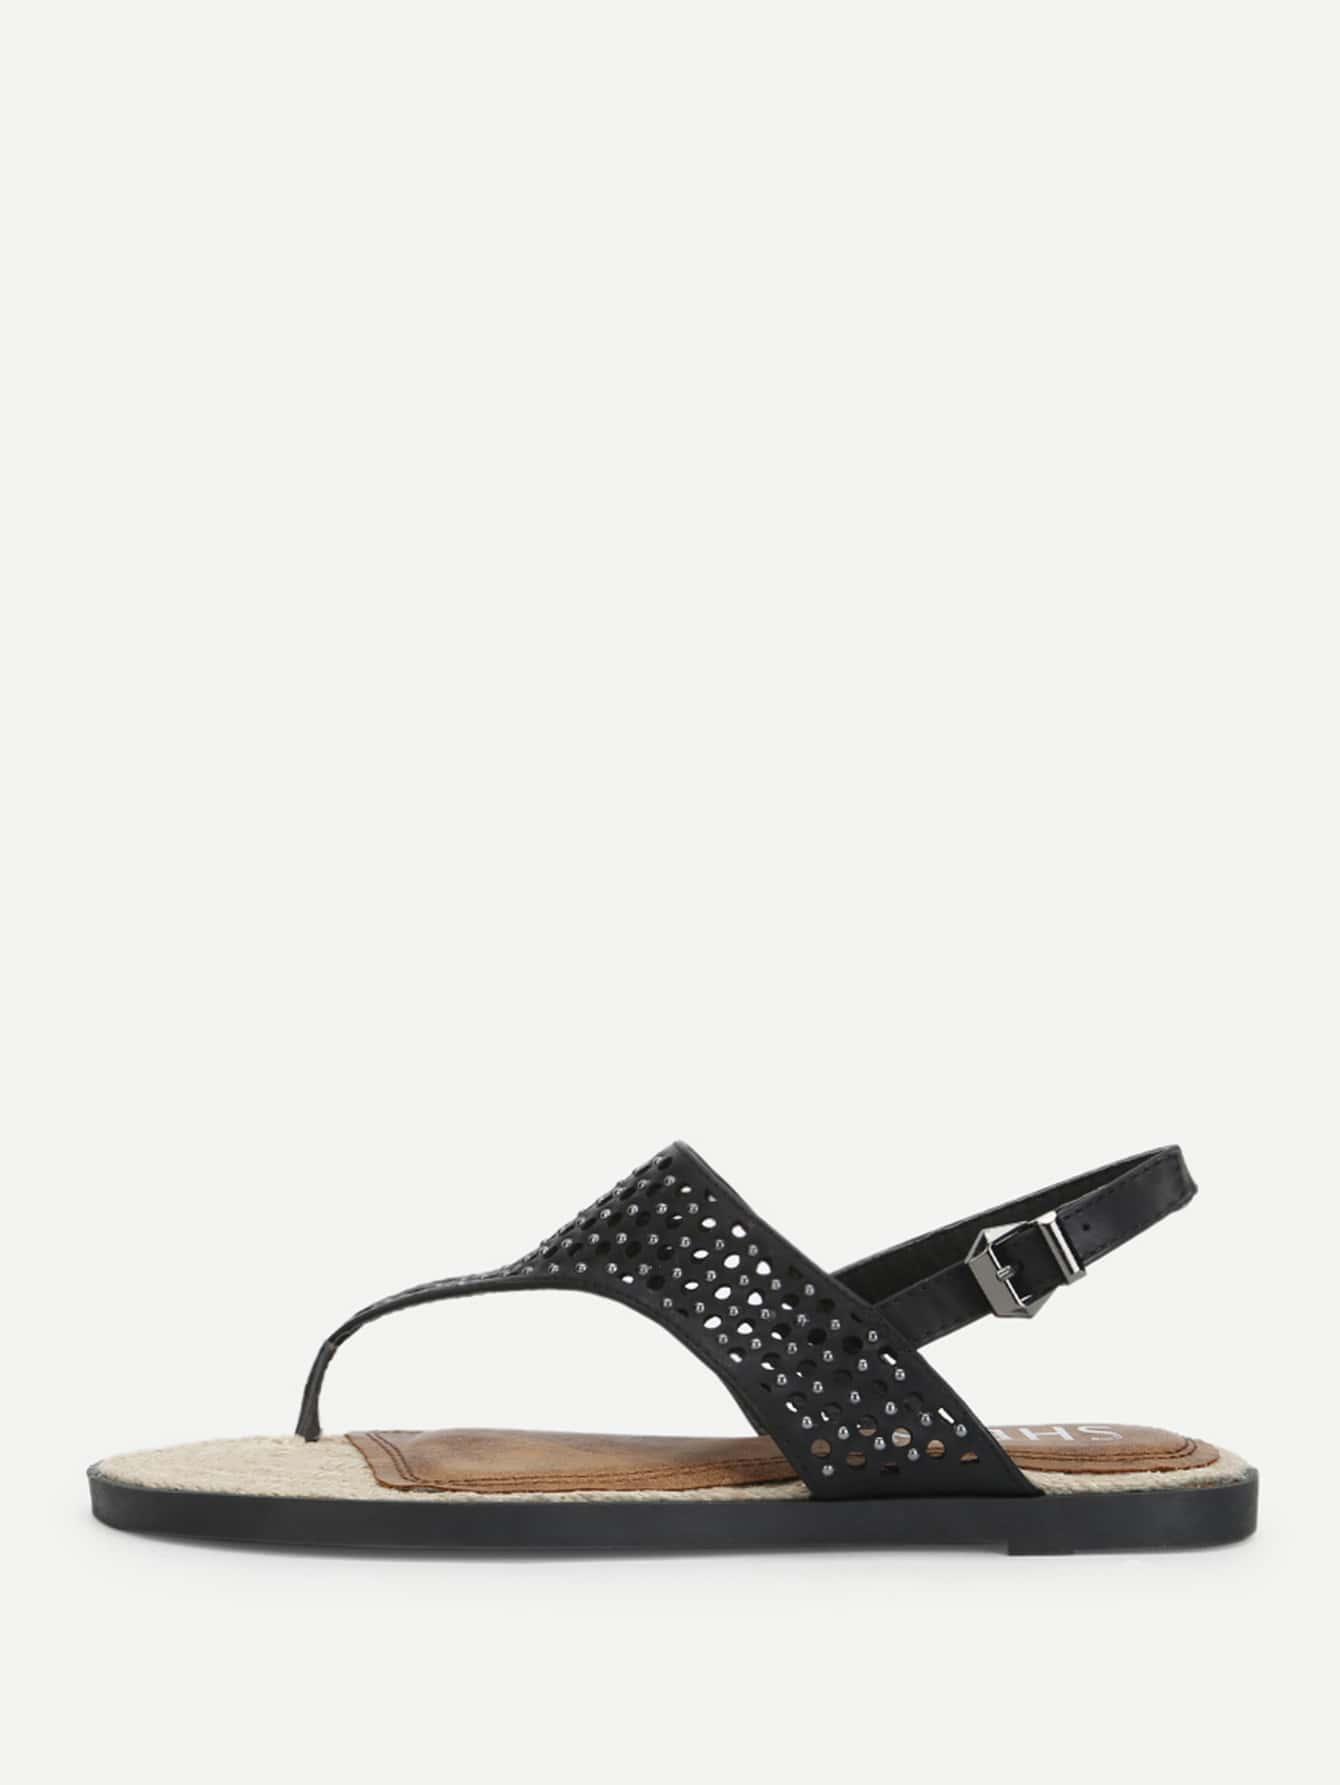 Cut Out Design Toe Post Sandals rhinestone design toe post sandals